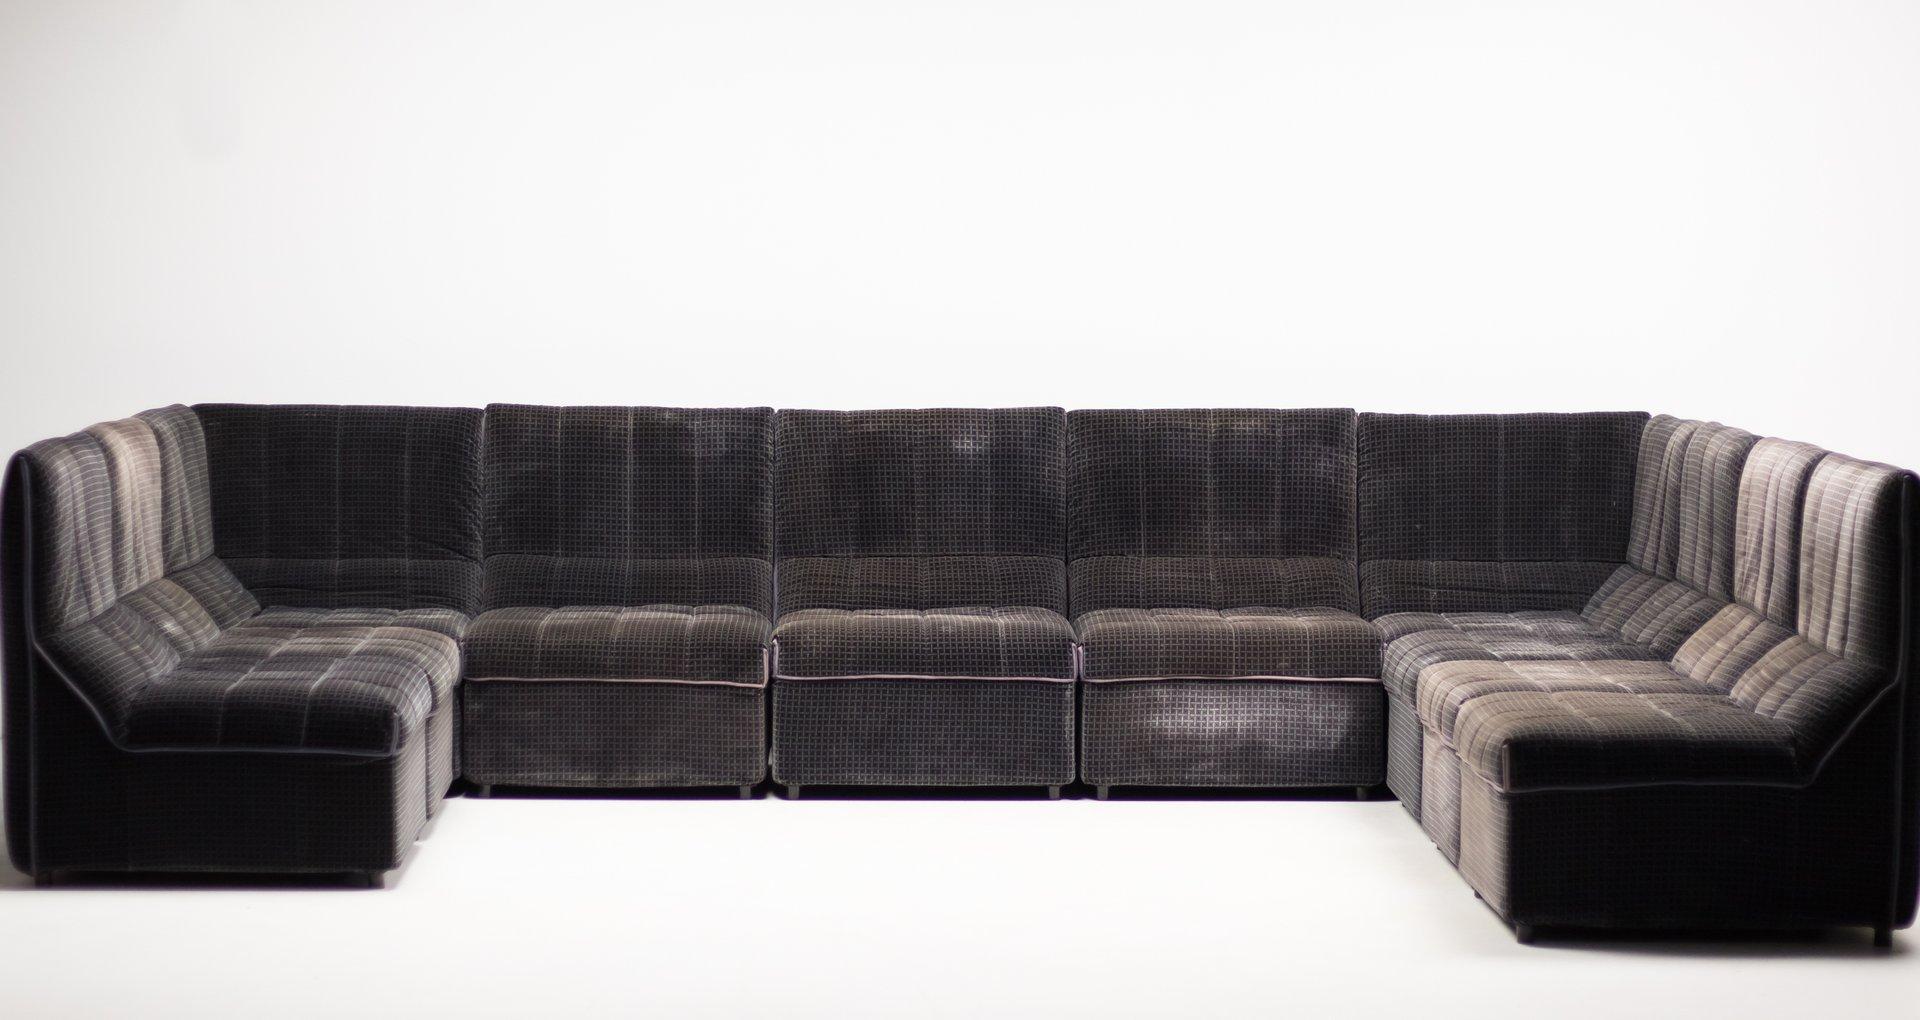 Baia Sectional Sofa By Antonio Citterio Paolo Nava For B B Italia 1977 For Sale At Pamono